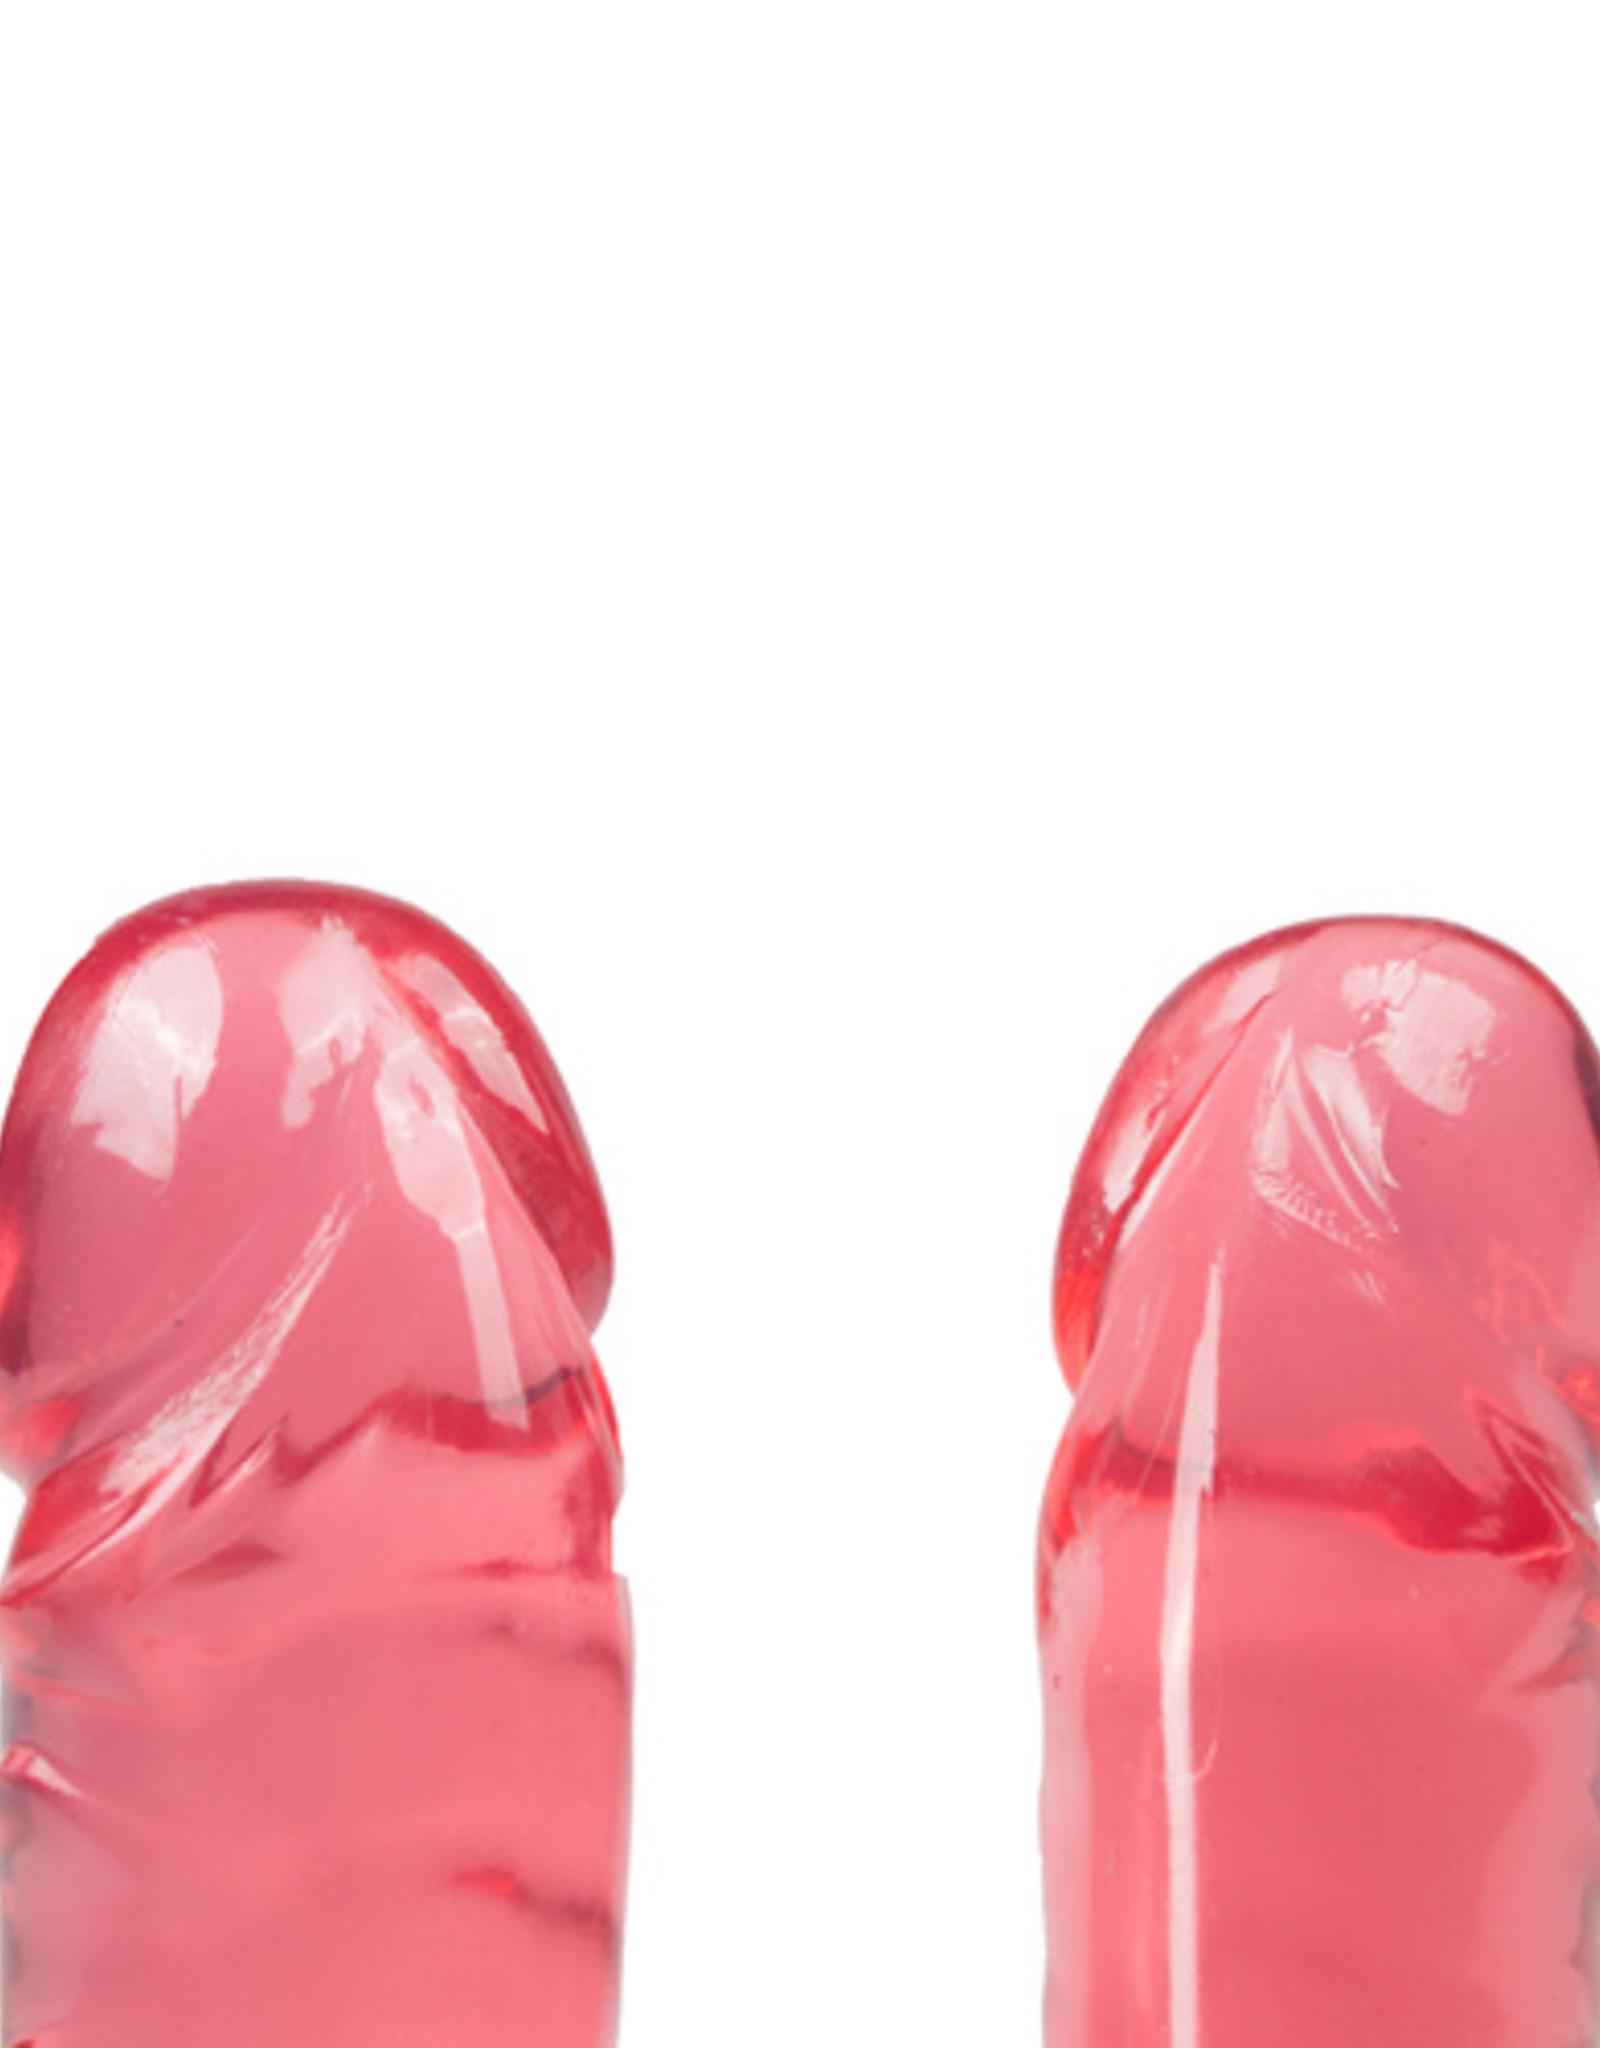 Crystal Jellies Crystal Jellies Dubbel Dildo - Roze